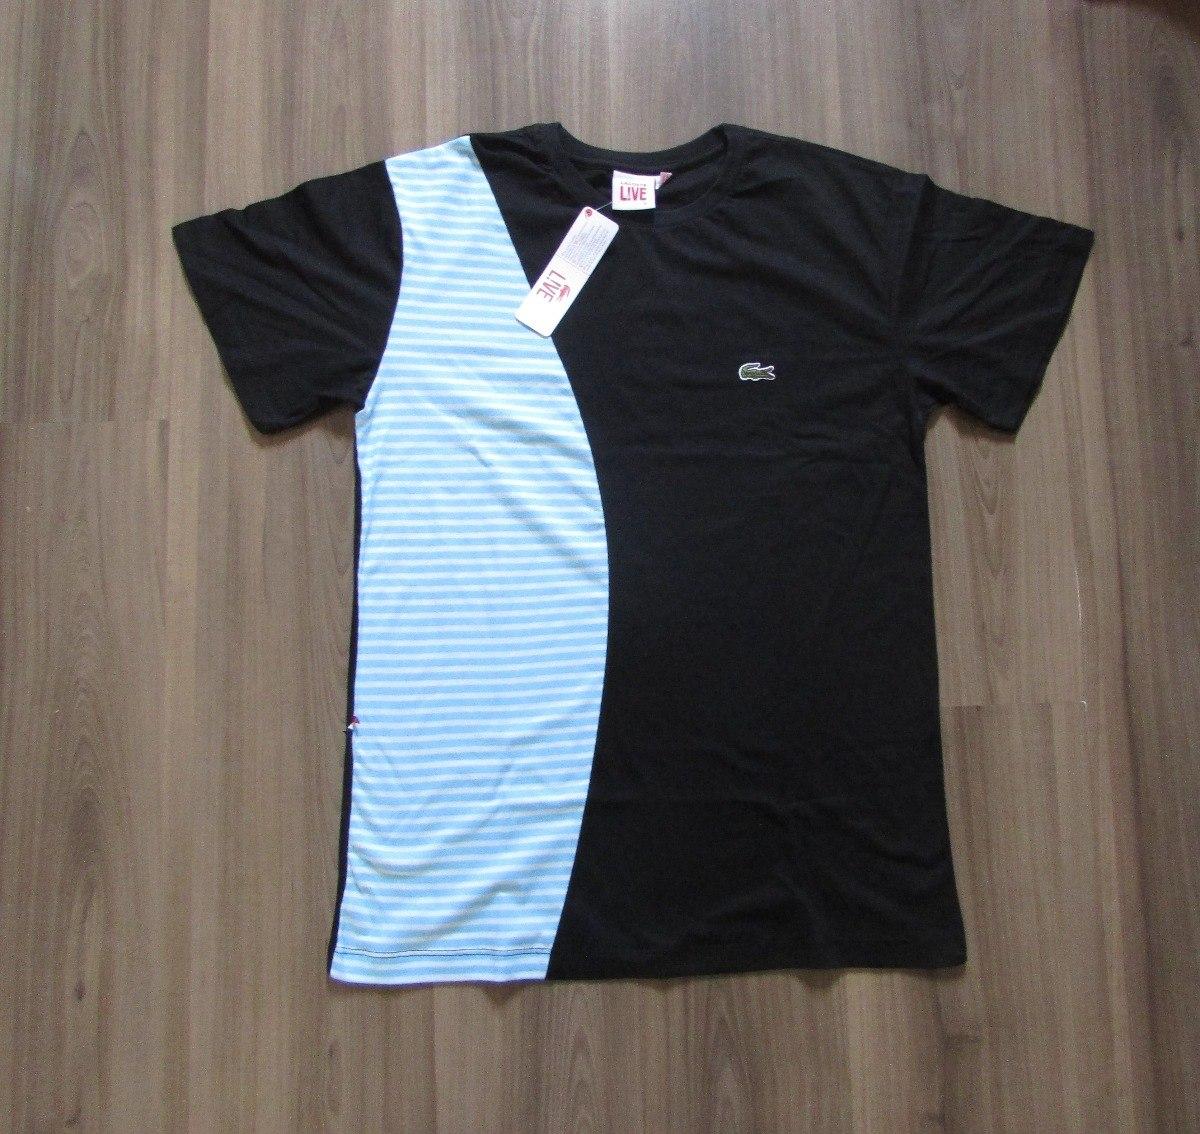 759cd8b08ea Camiseta Lacoste Live Original Peruana Oferta Listrada Preta - R  69 ...